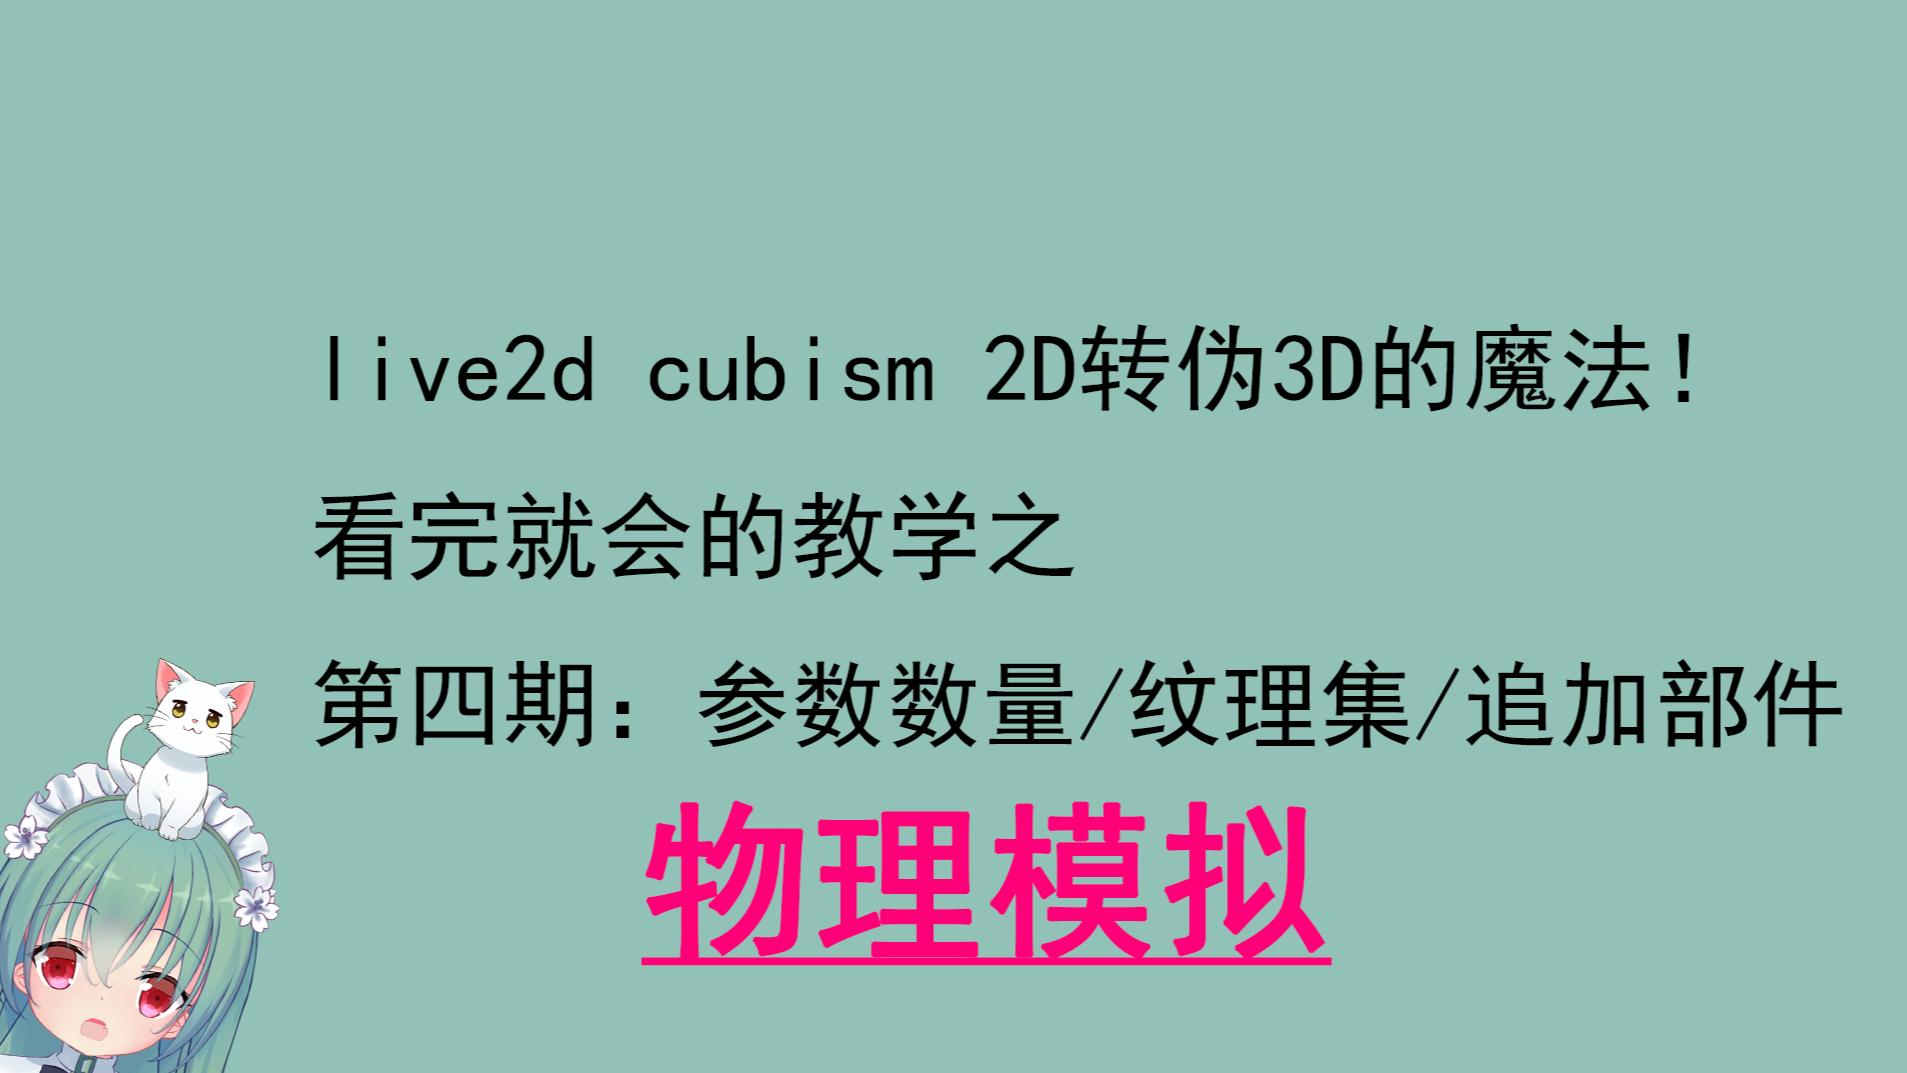 live2d cubism教学第四期:参数/物理模拟/追加部件/纹理集